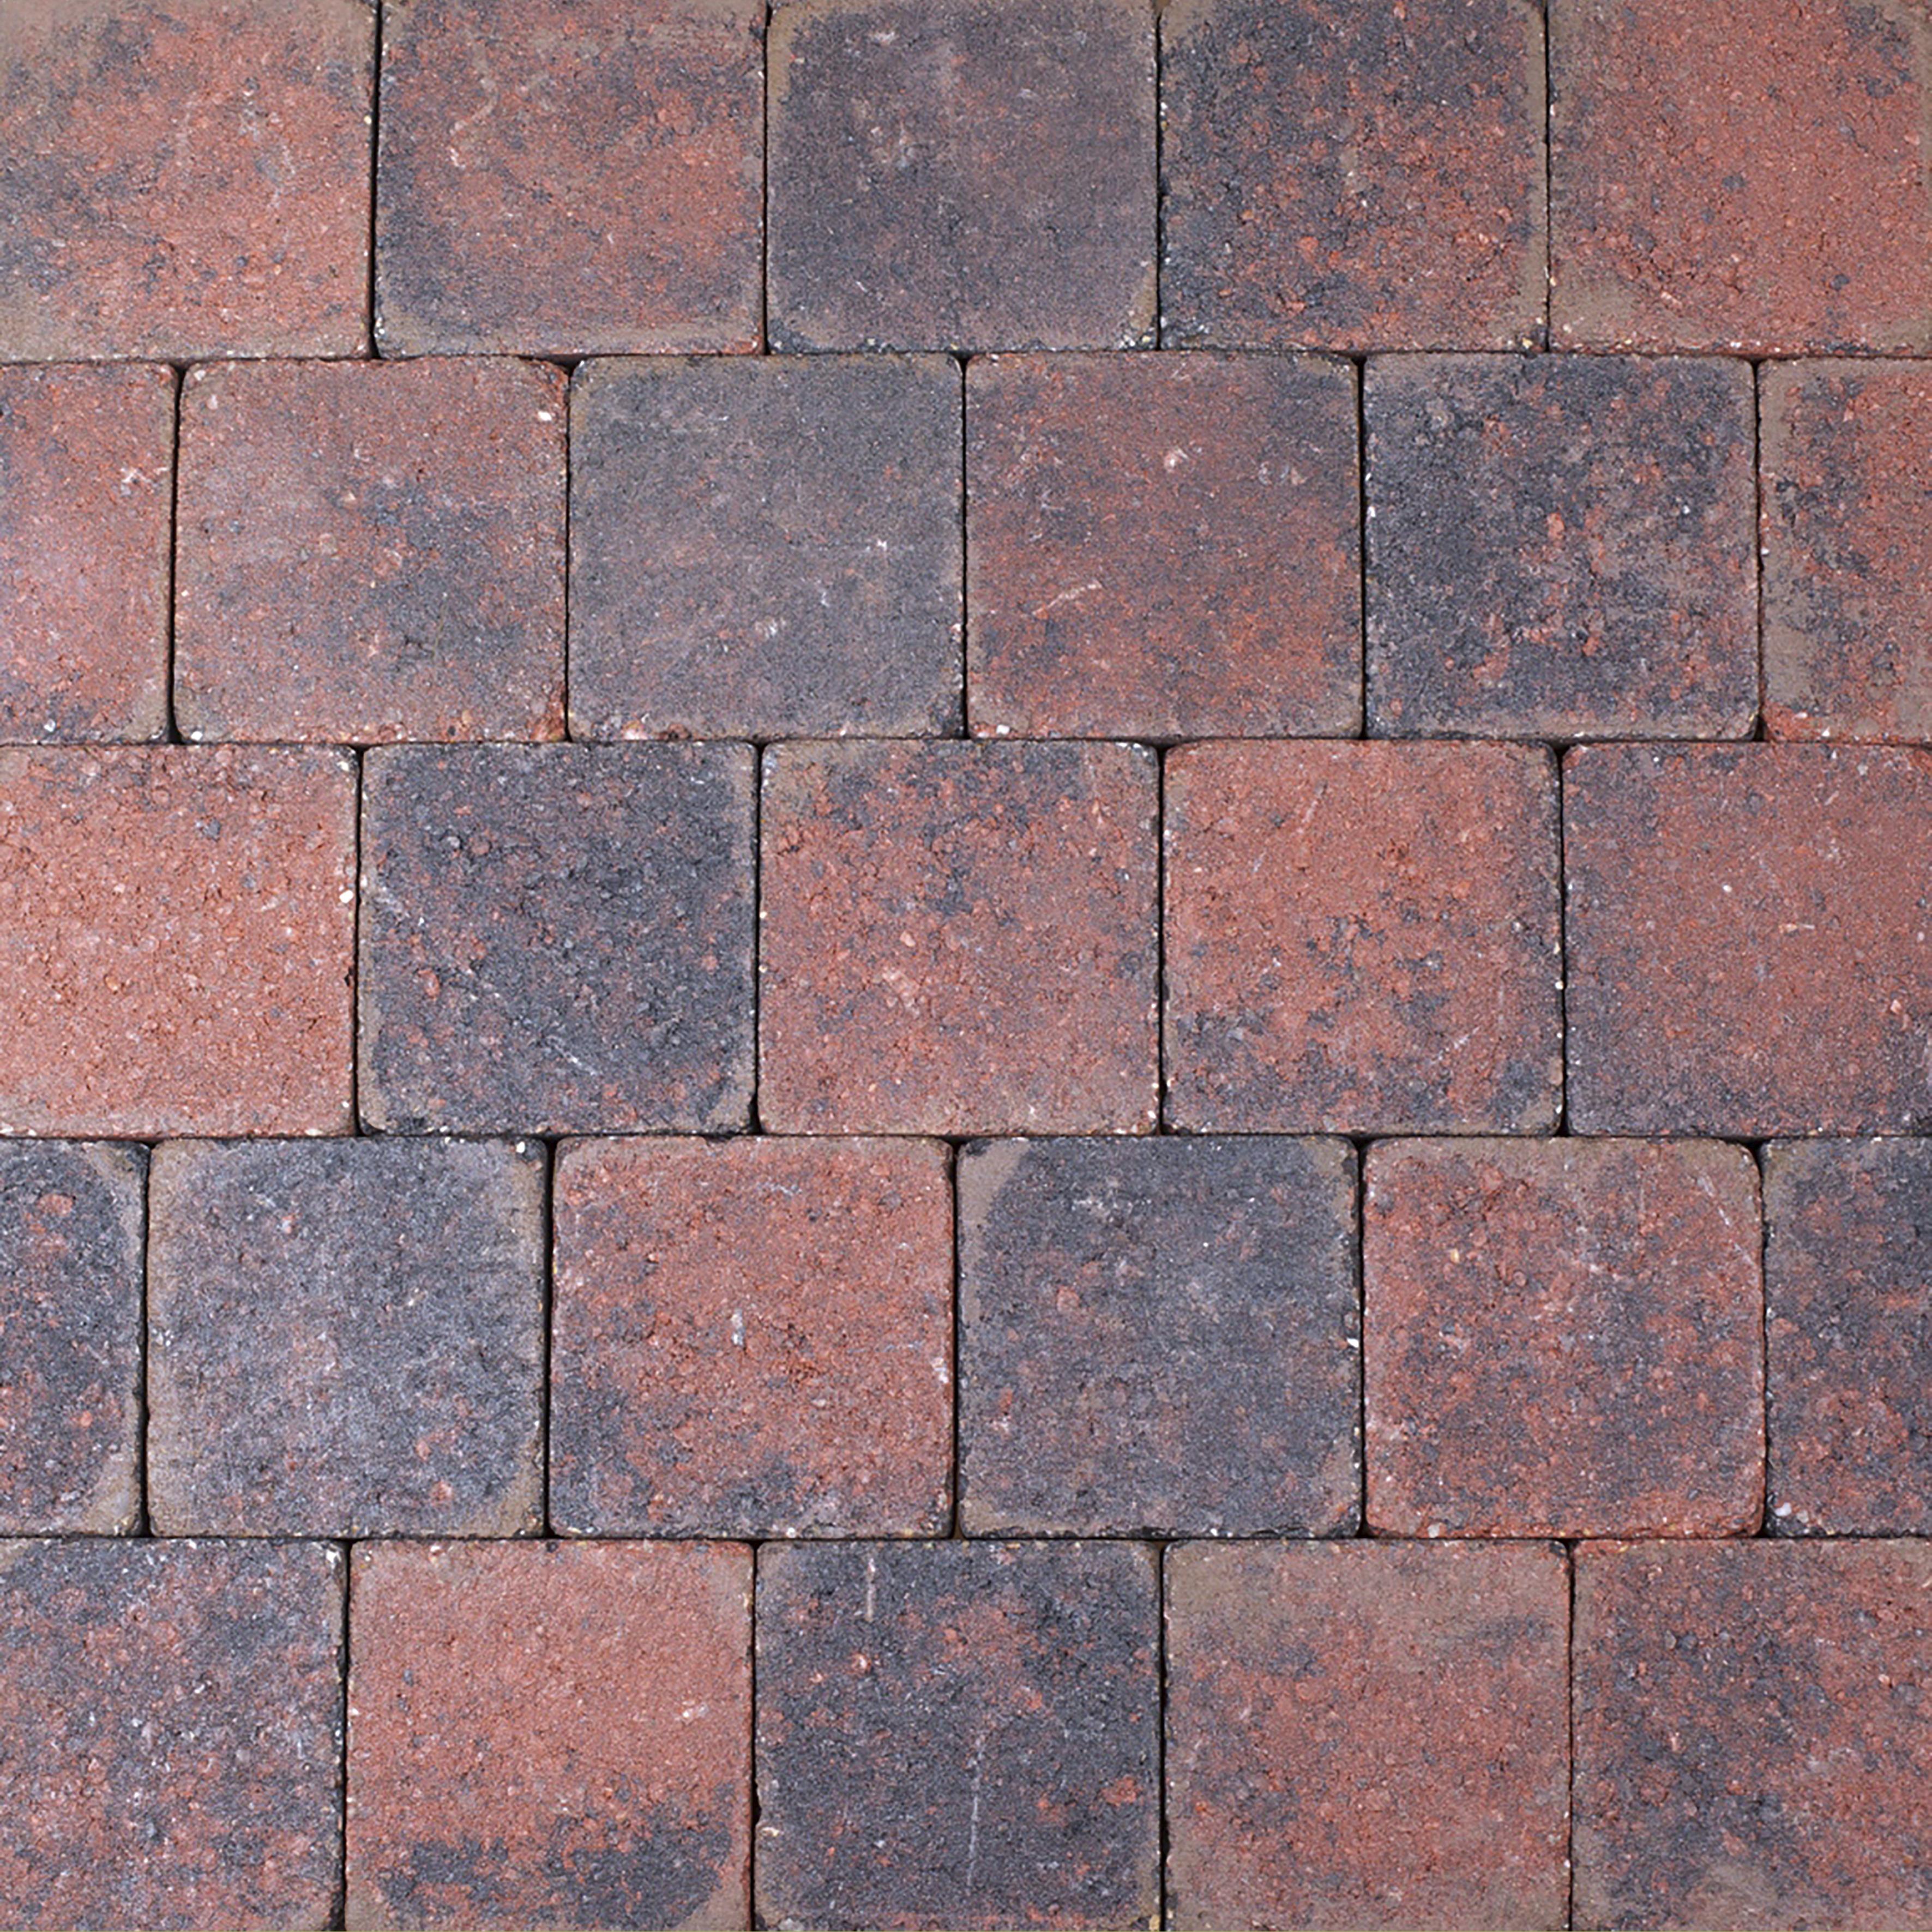 Trommelsteen Beton Rood/Zwart 14x14x7 cm - 45 Stuks - 0,88 m2